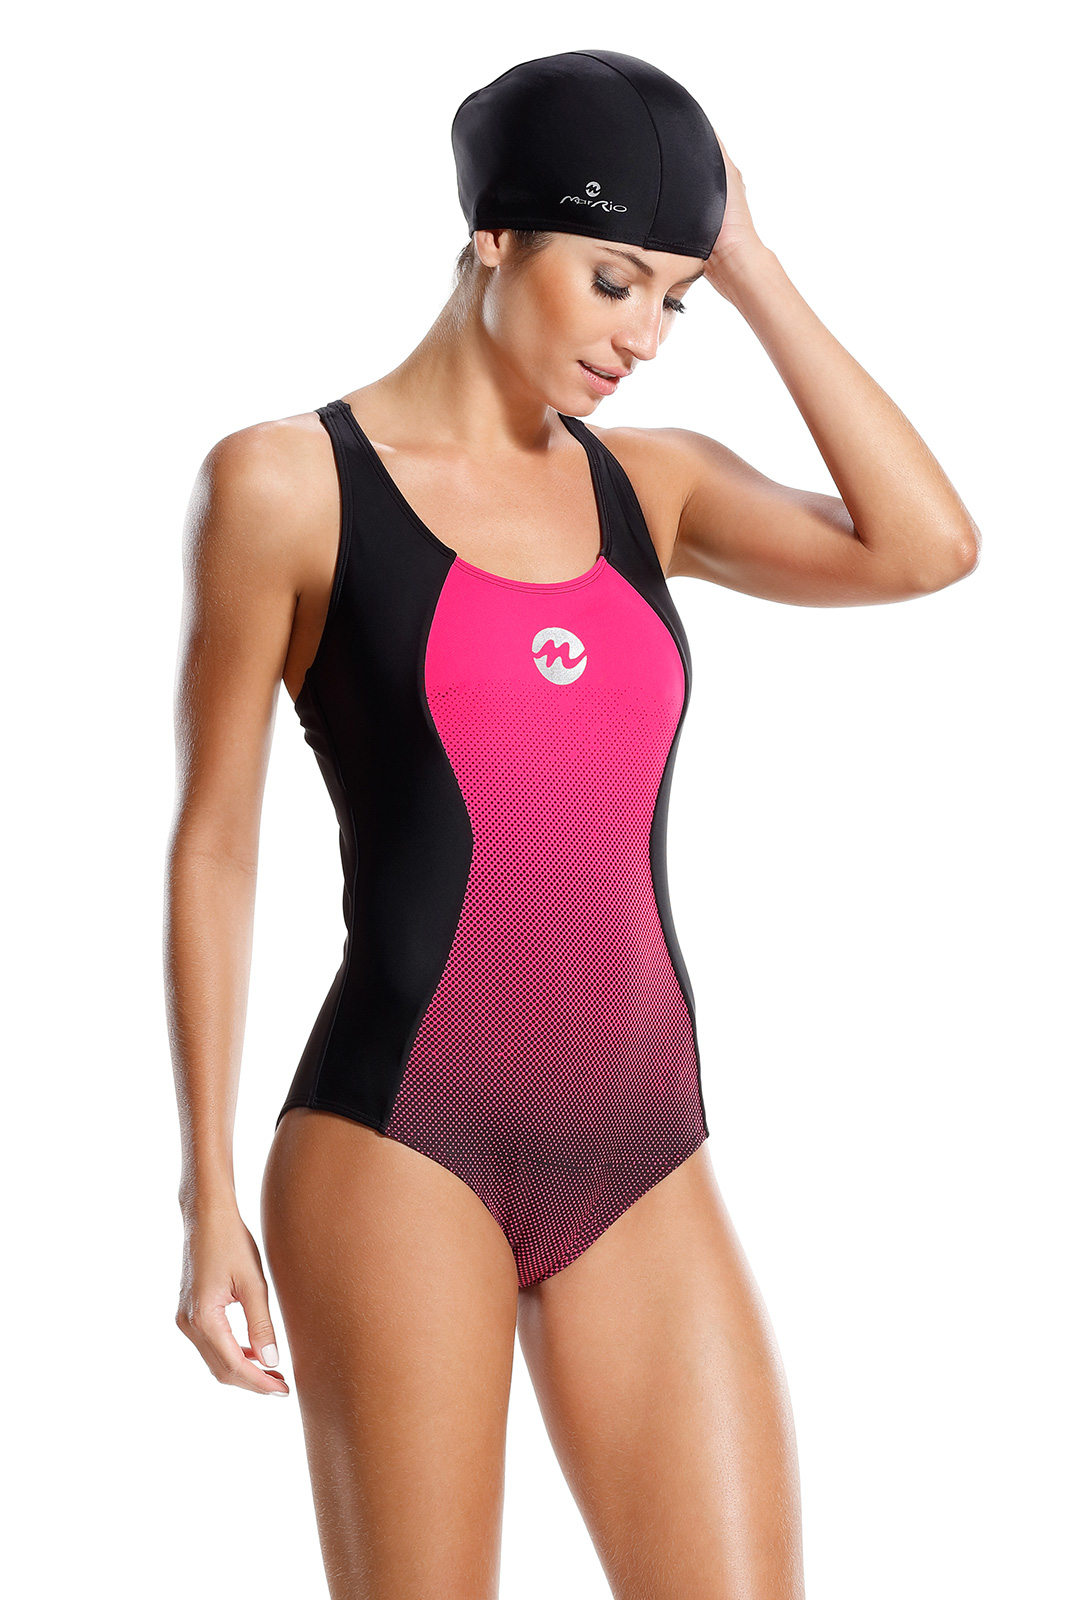 31220d6301b Ολόσωμα Ροζ και μαύρο, αθλητικό μαγιό - Maio Caribe